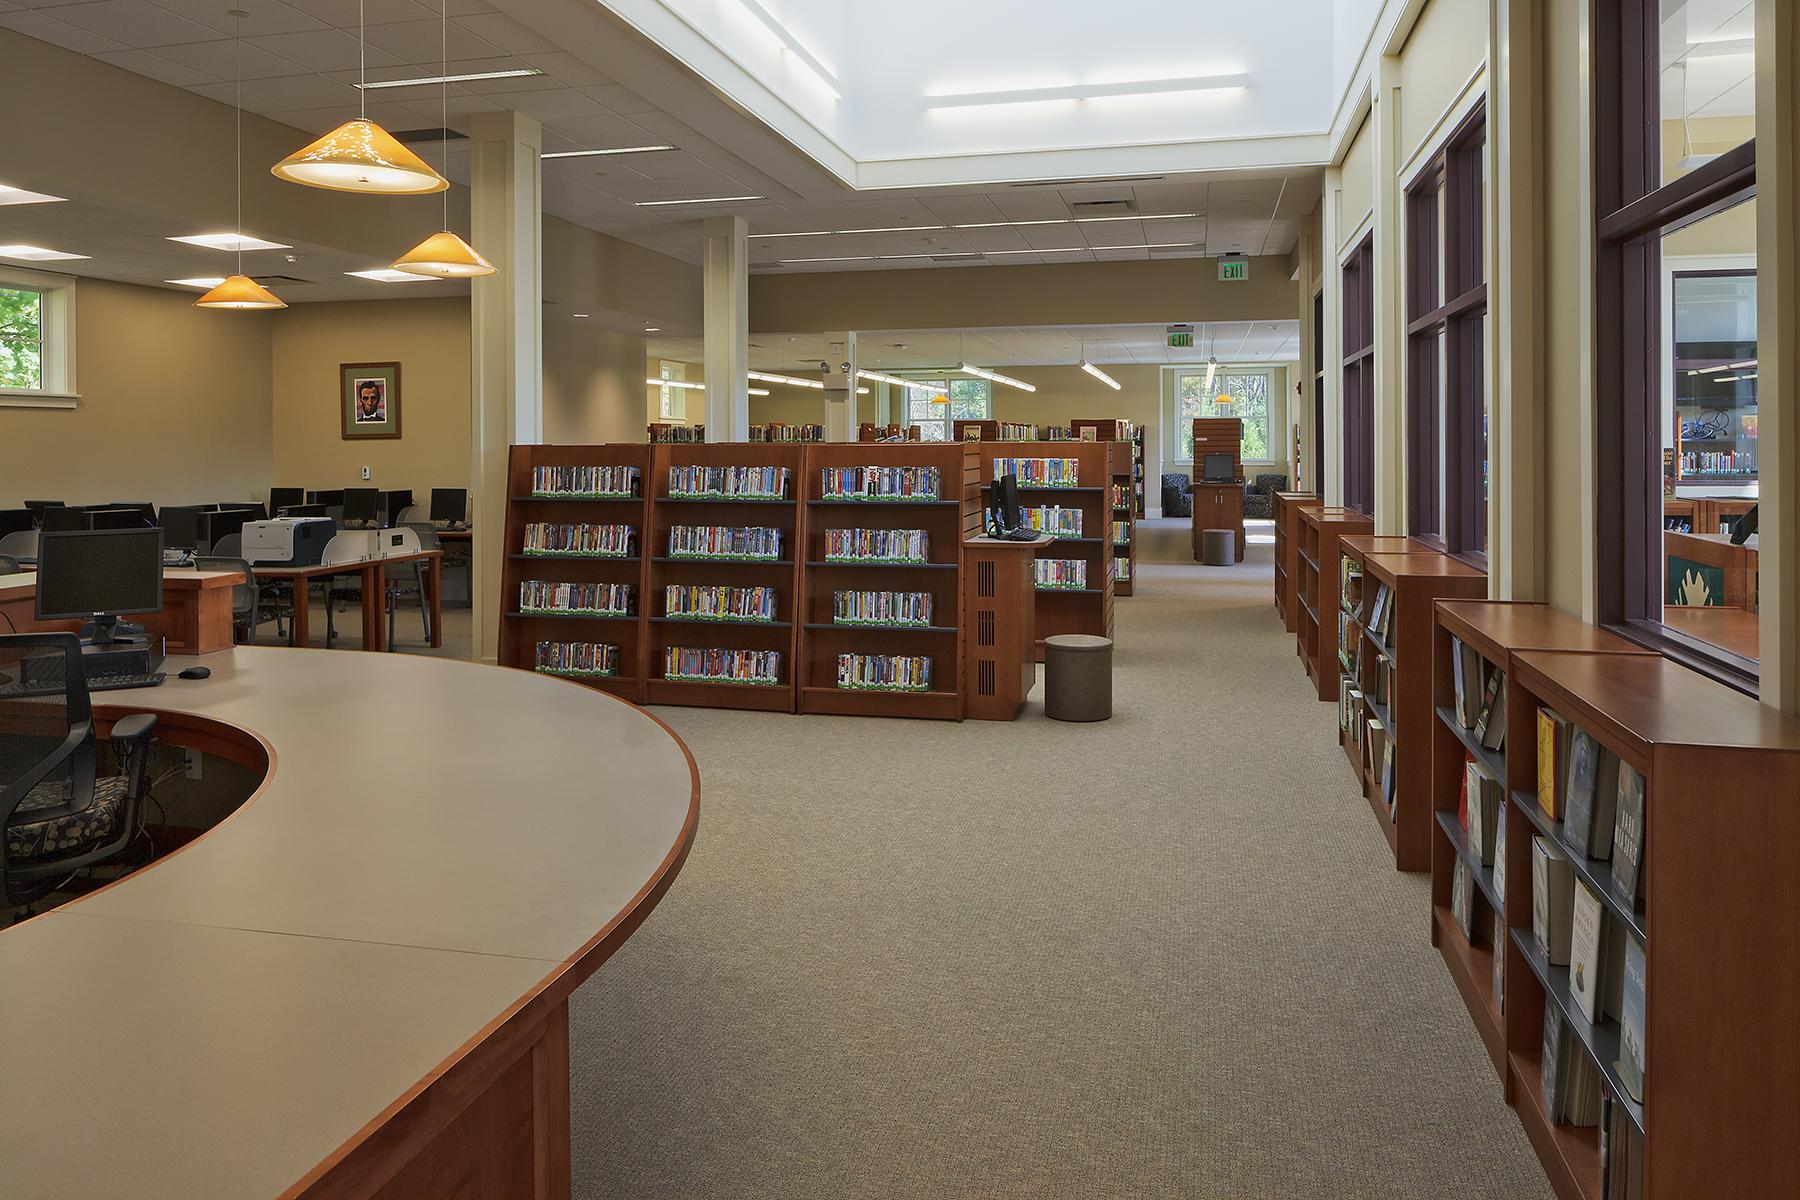 Cairo Public Library